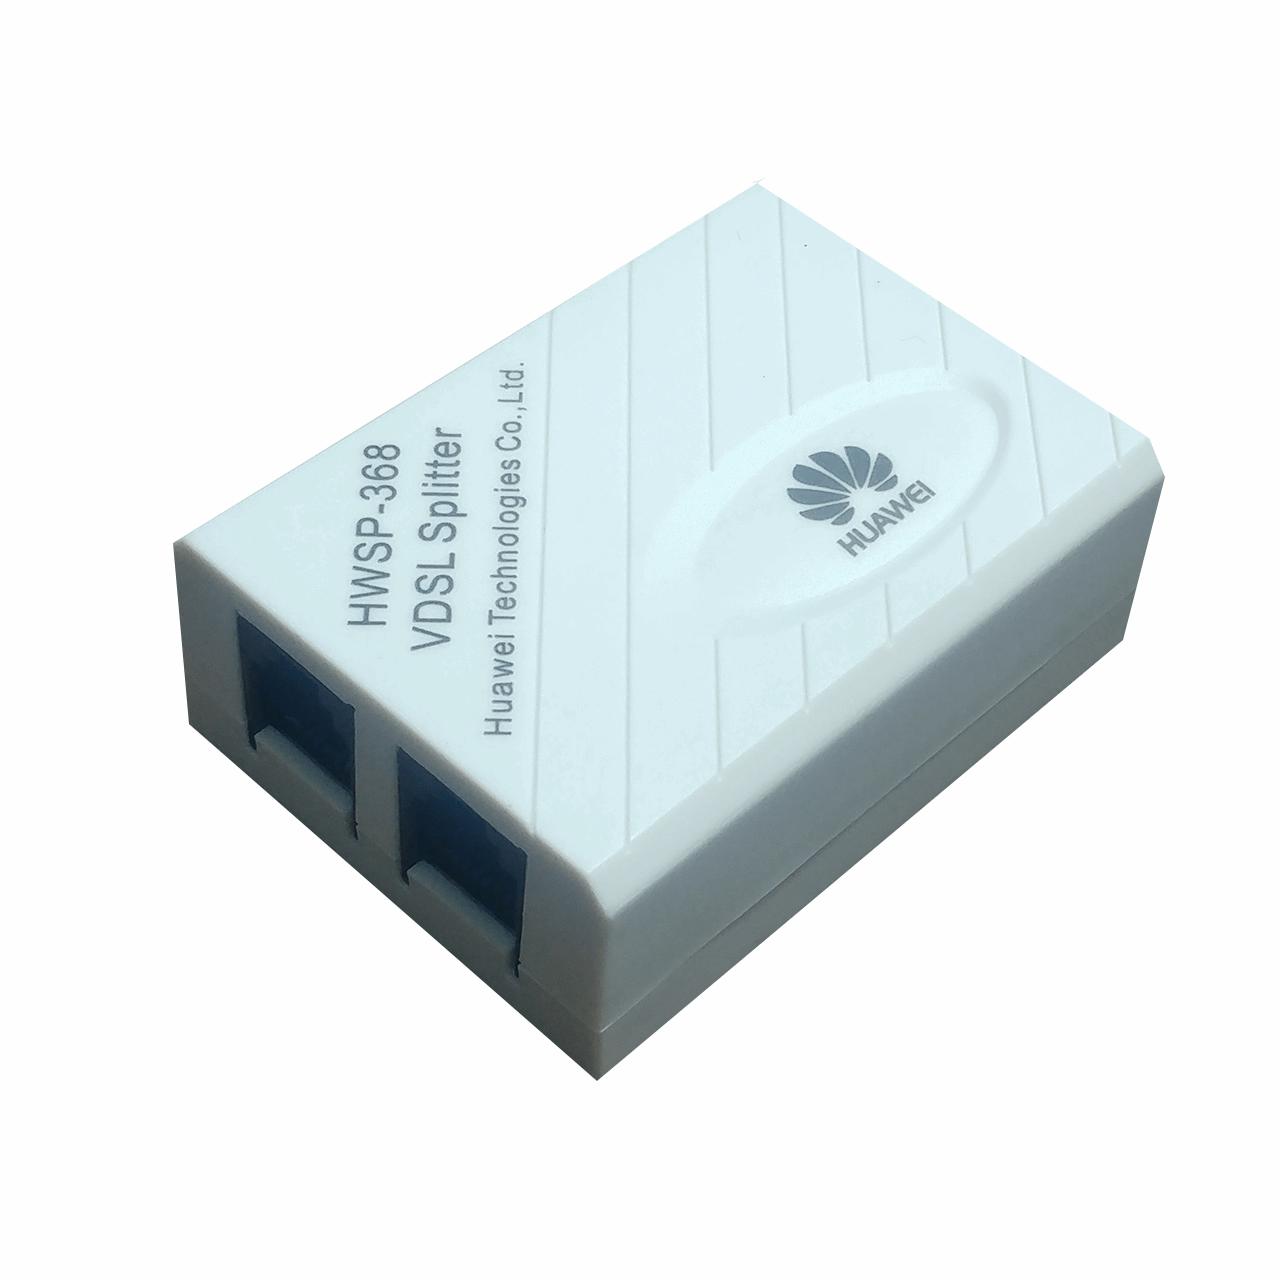 اسپلیتر هوآوی مدل HWSP-368